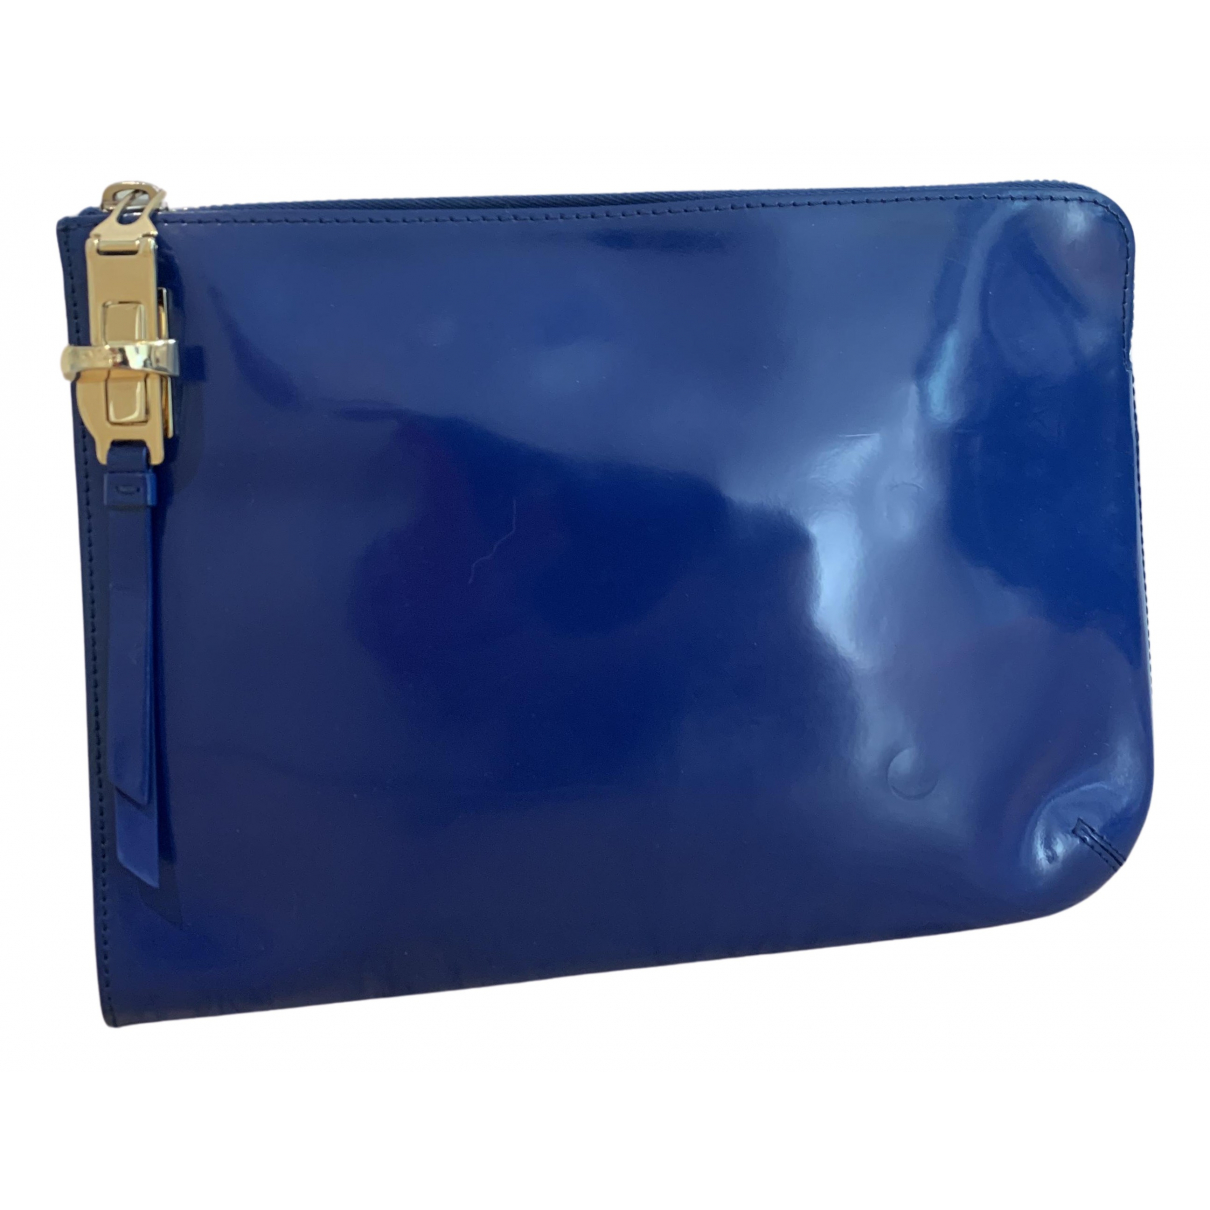 Max Mara - Pochette   pour femme en cuir verni - bleu